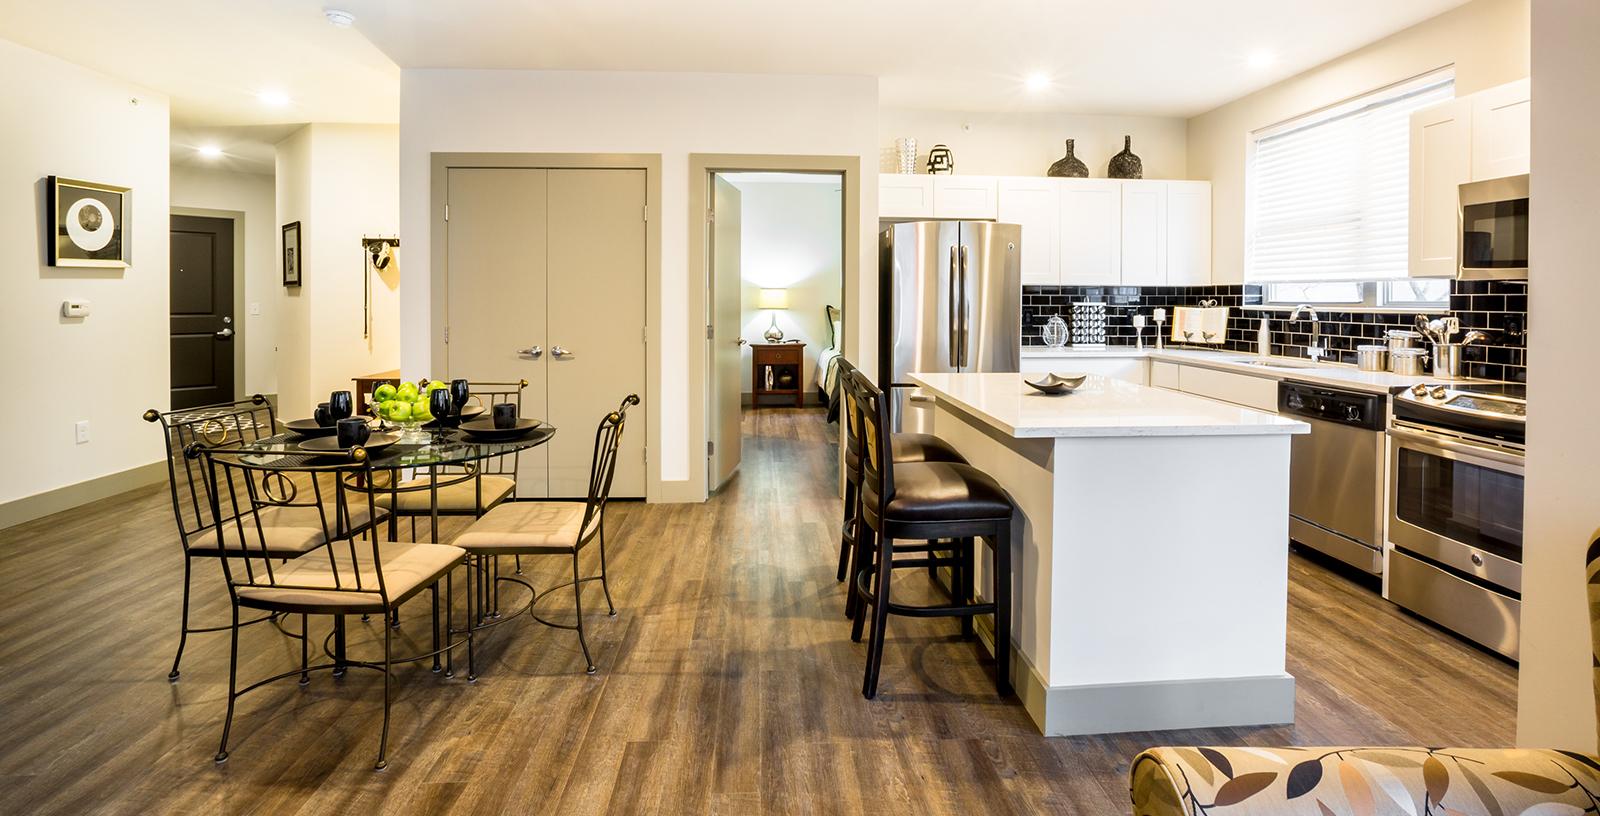 Luxury Apartments In Cincinnati | The Whitfield